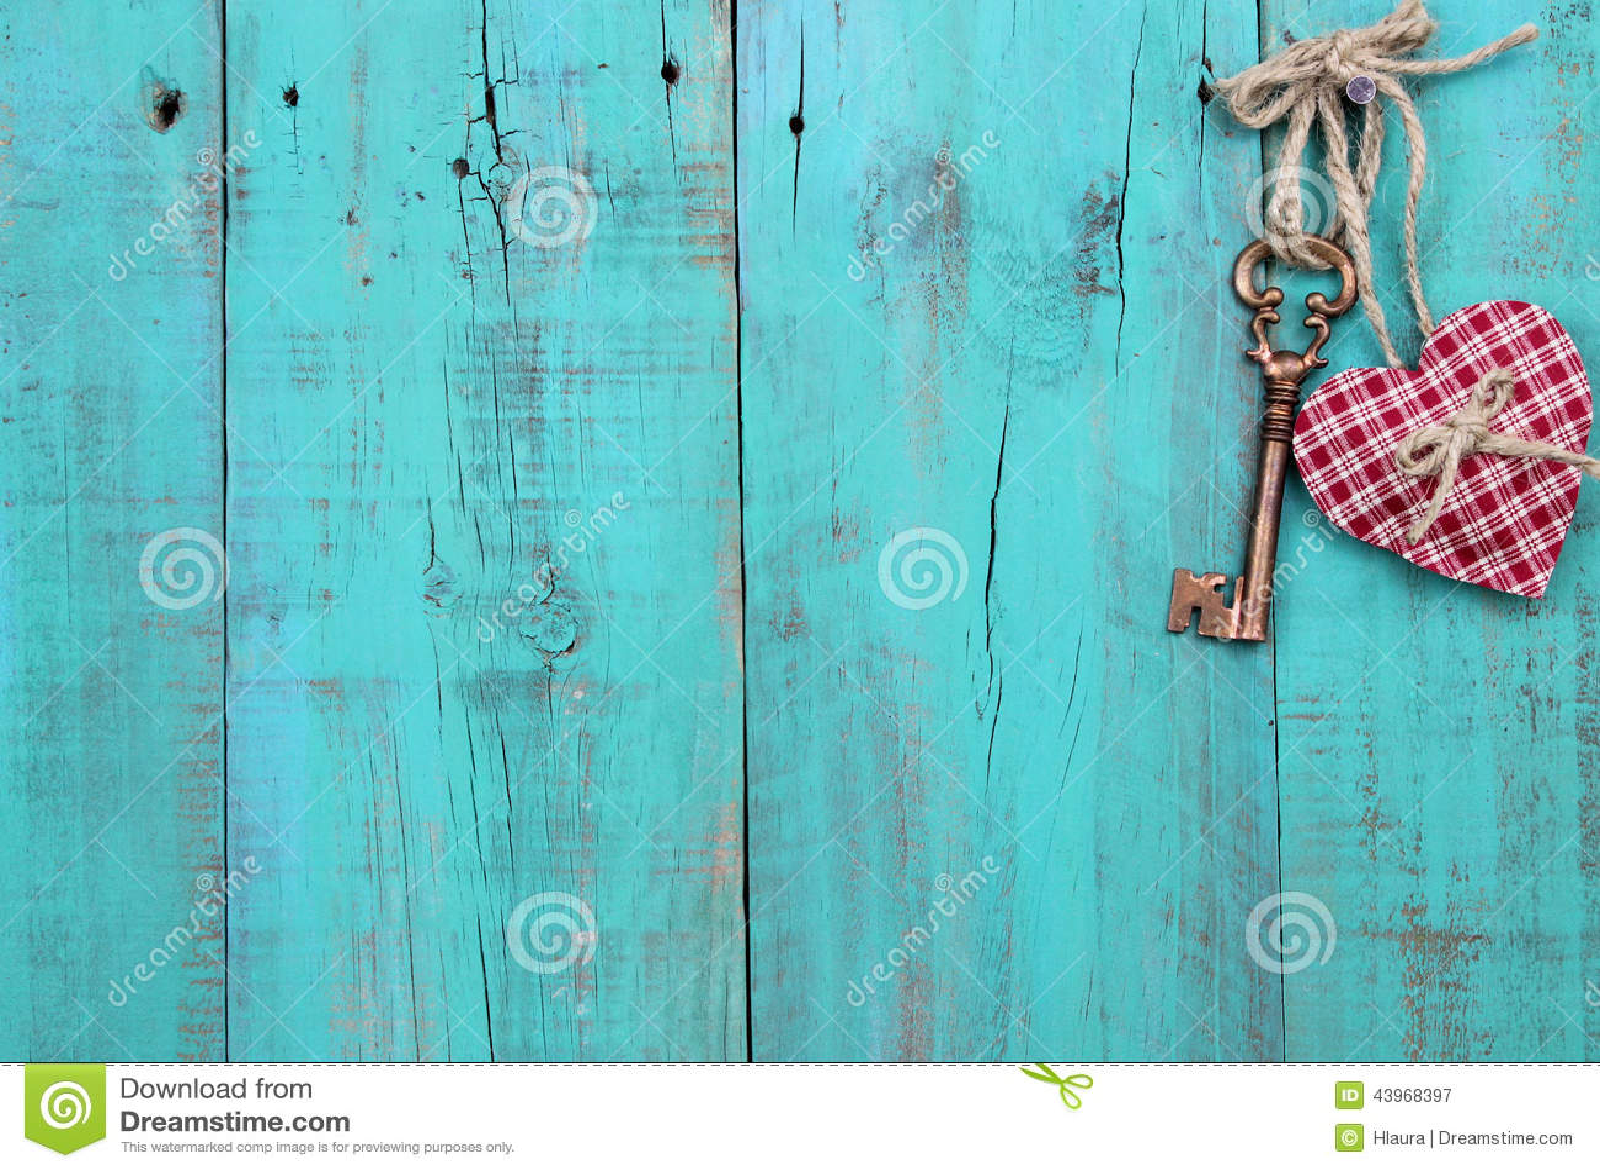 Turquoise Blue Skeleton Painting